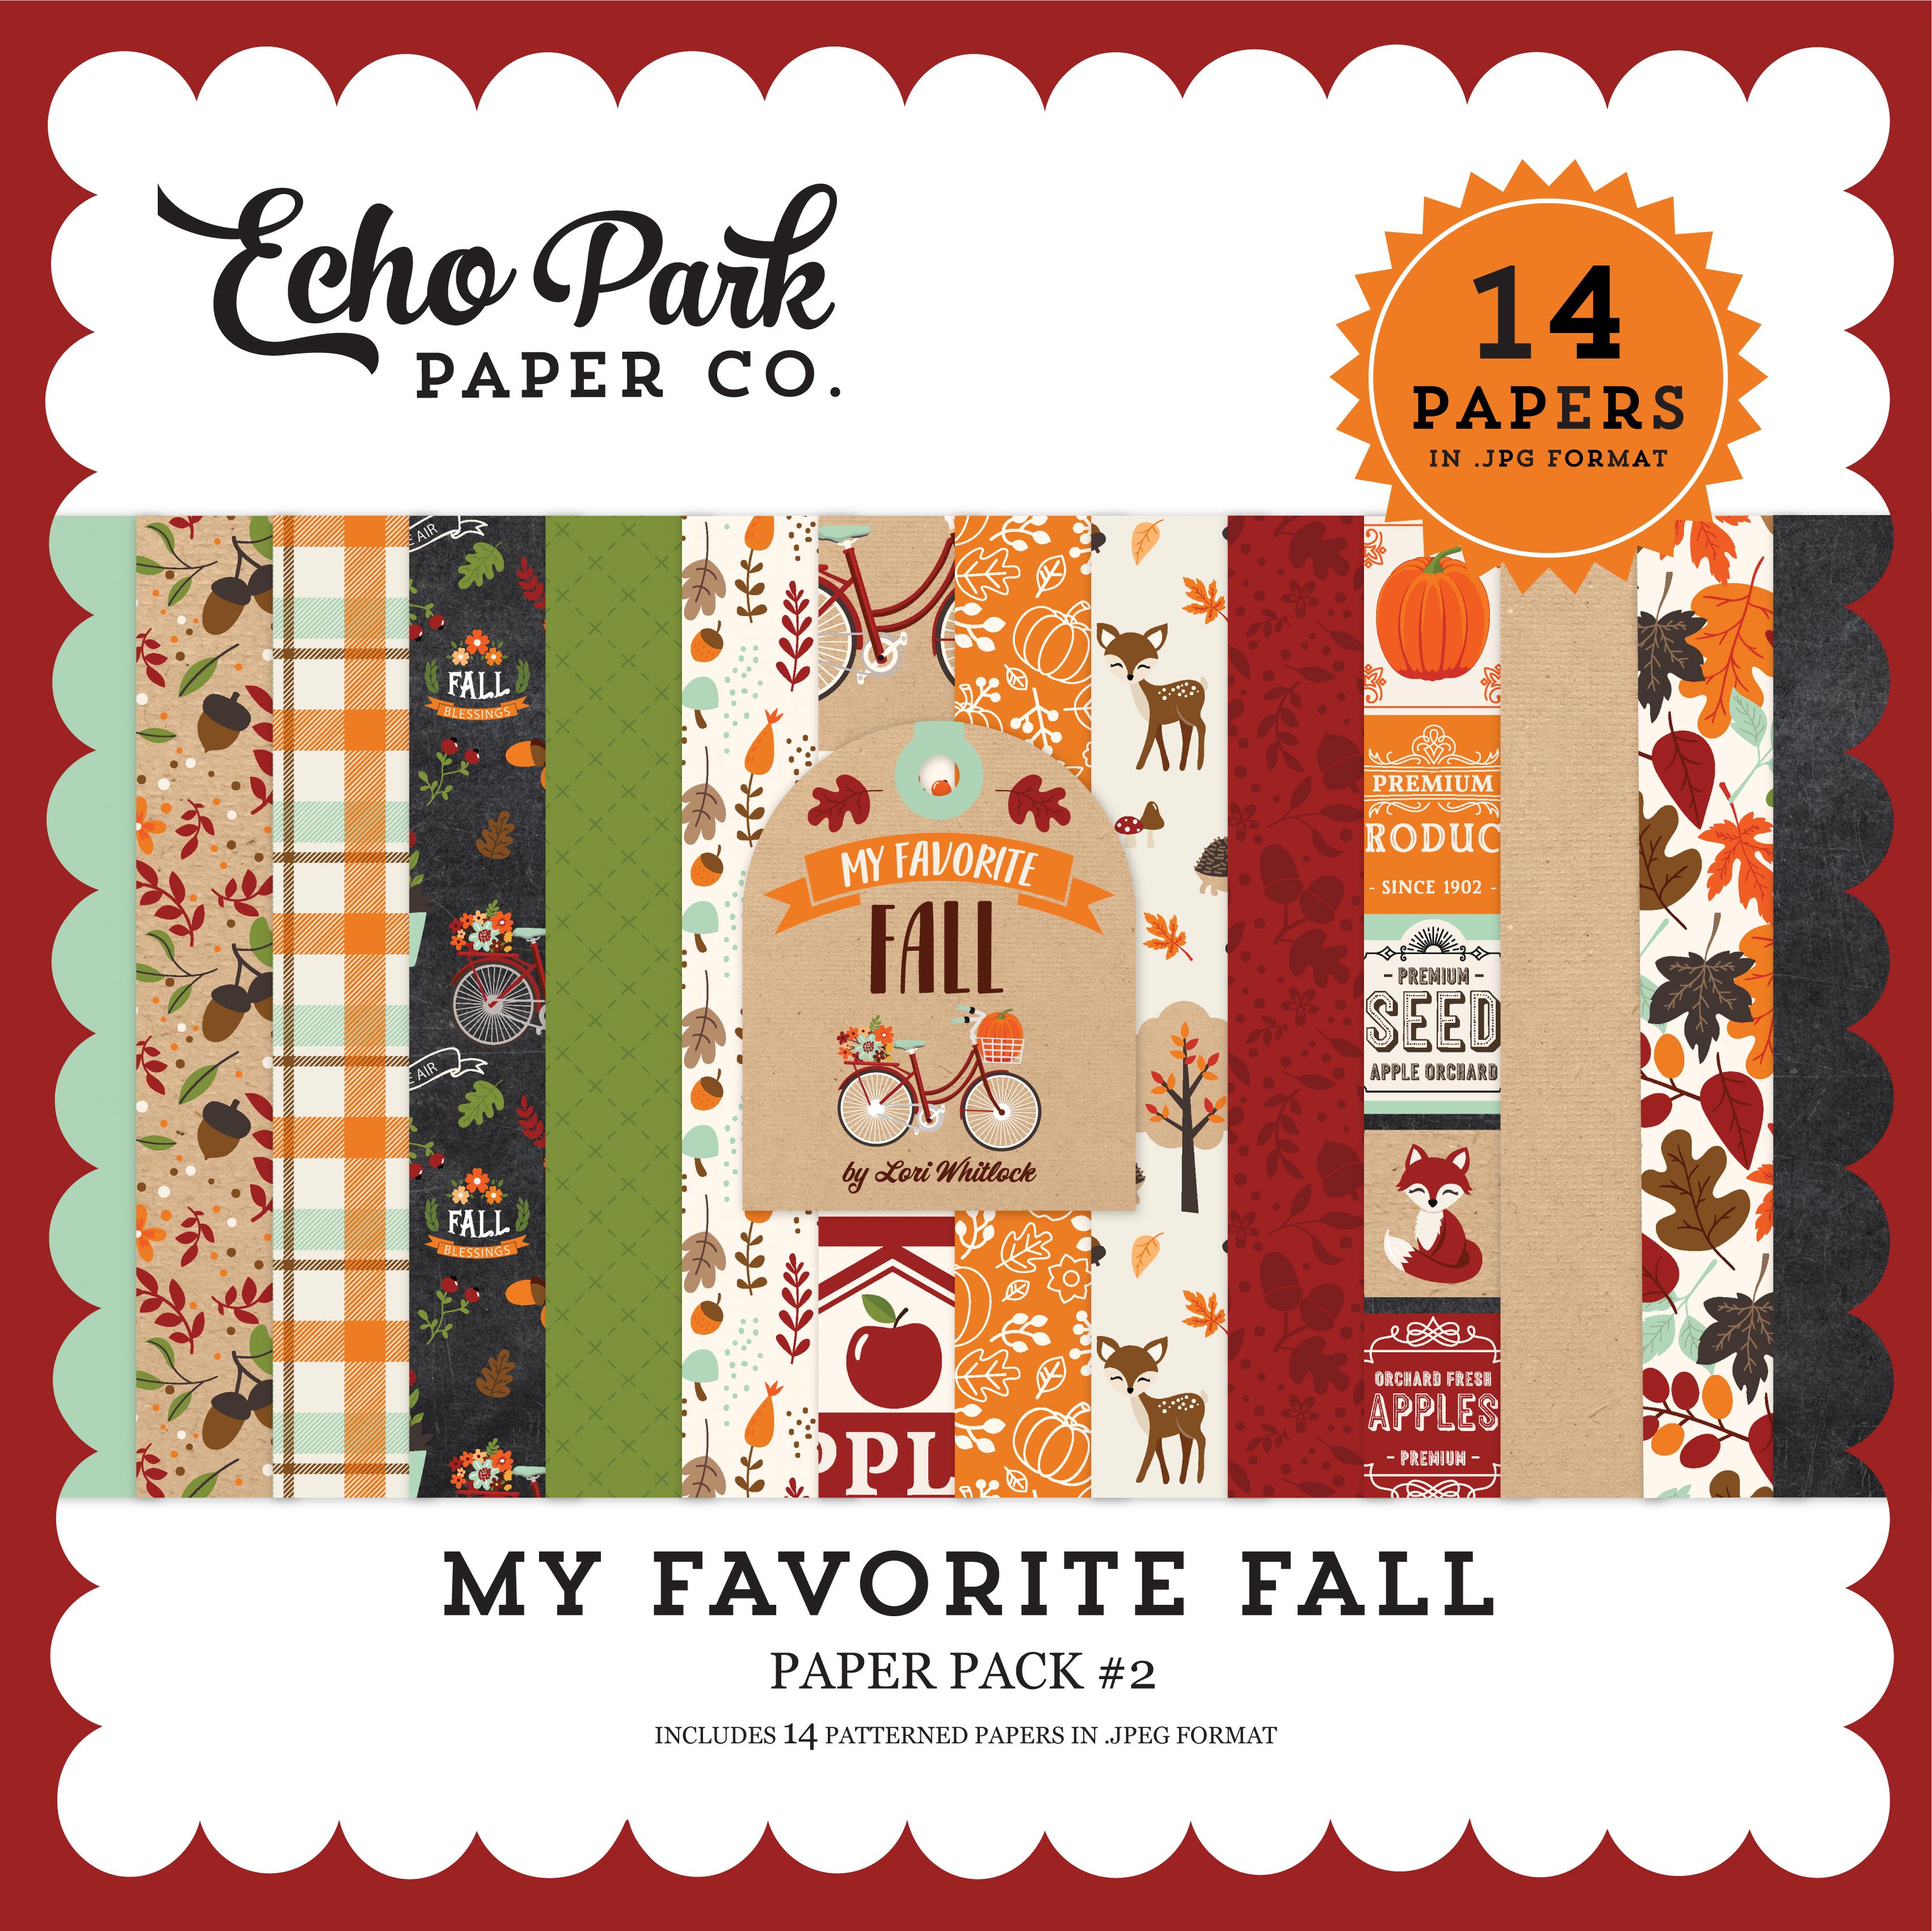 My Favorite Fall Paper Pack #2